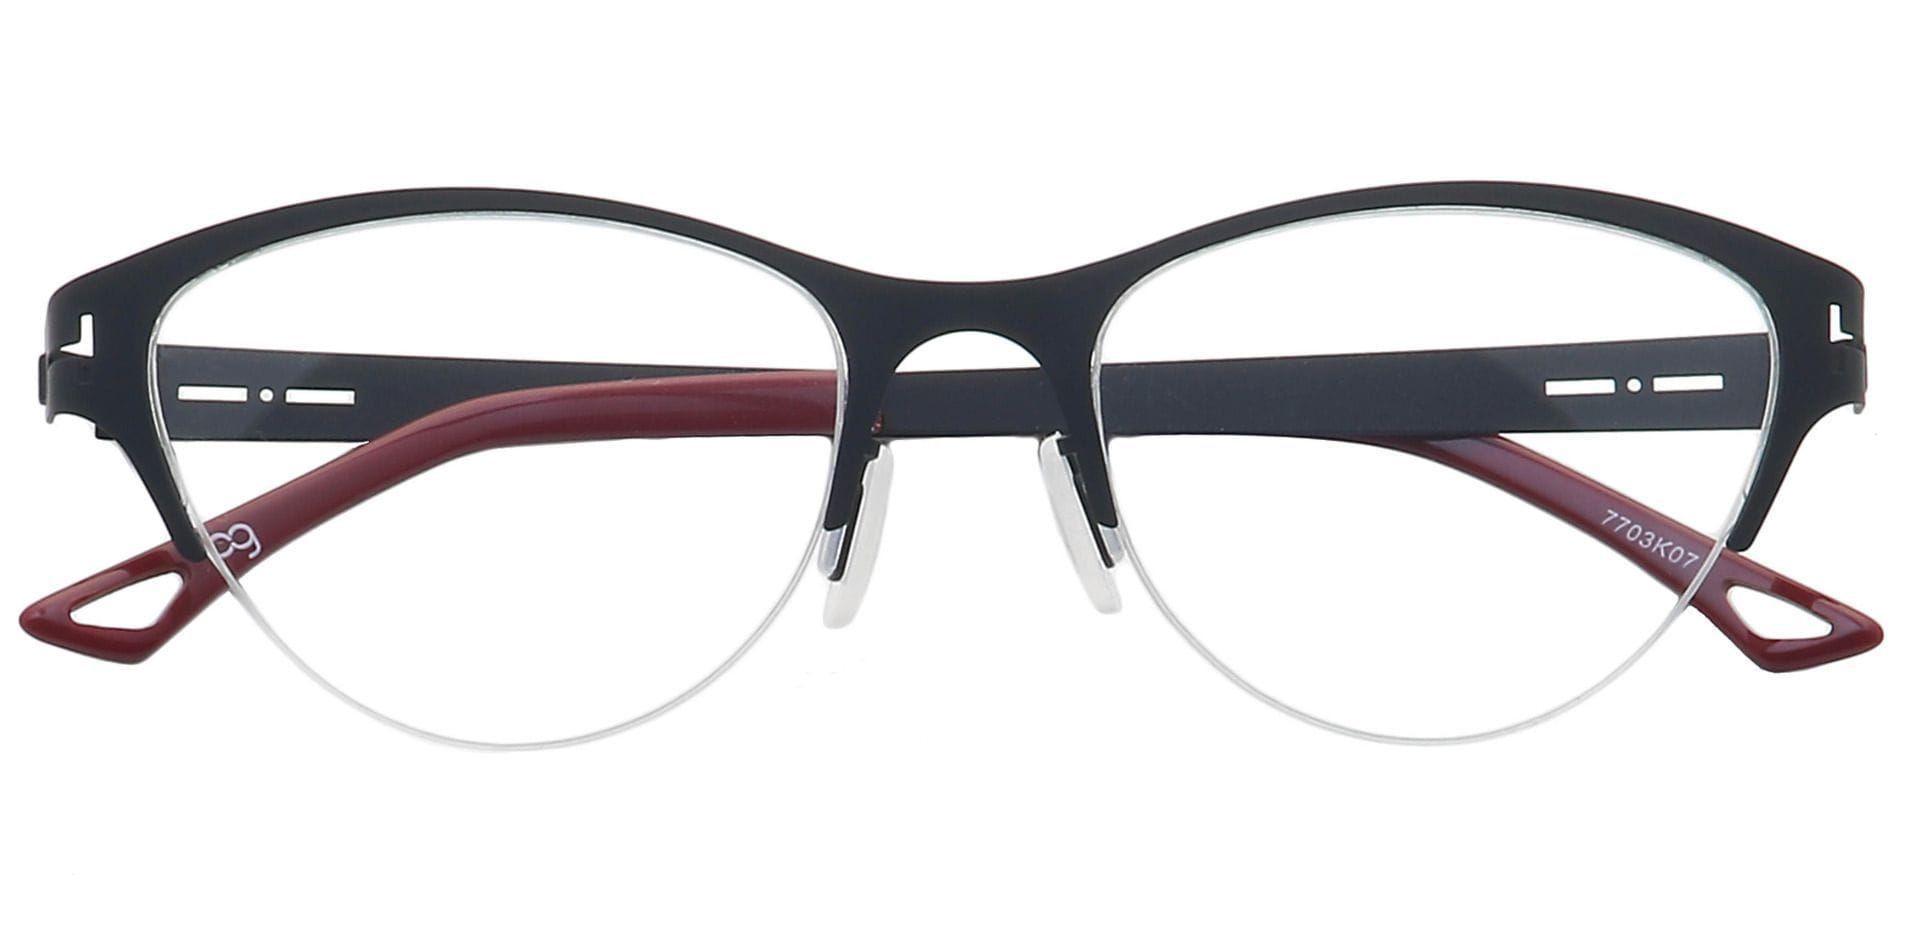 Ain Cat-Eye Non-Rx Glasses - Black